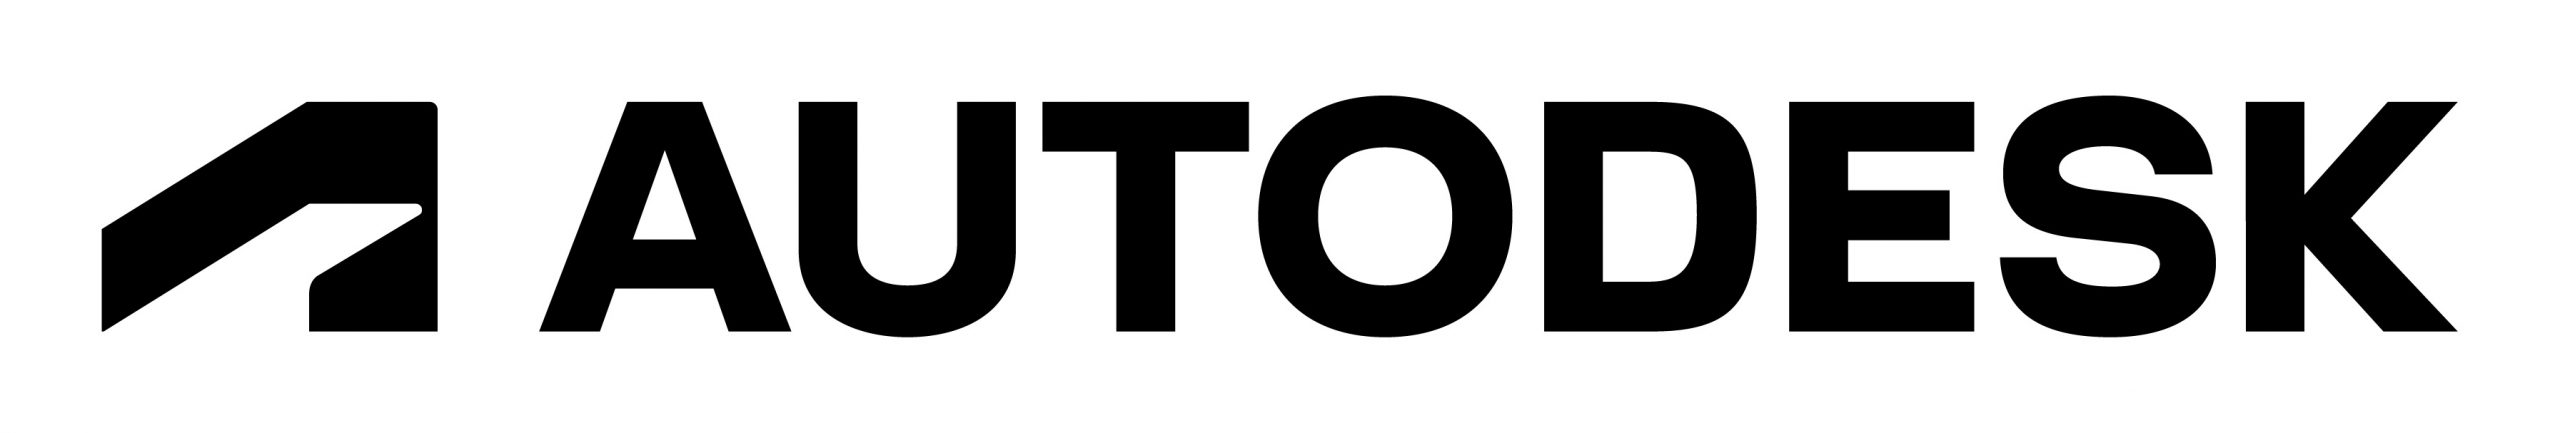 new Autodesk logo